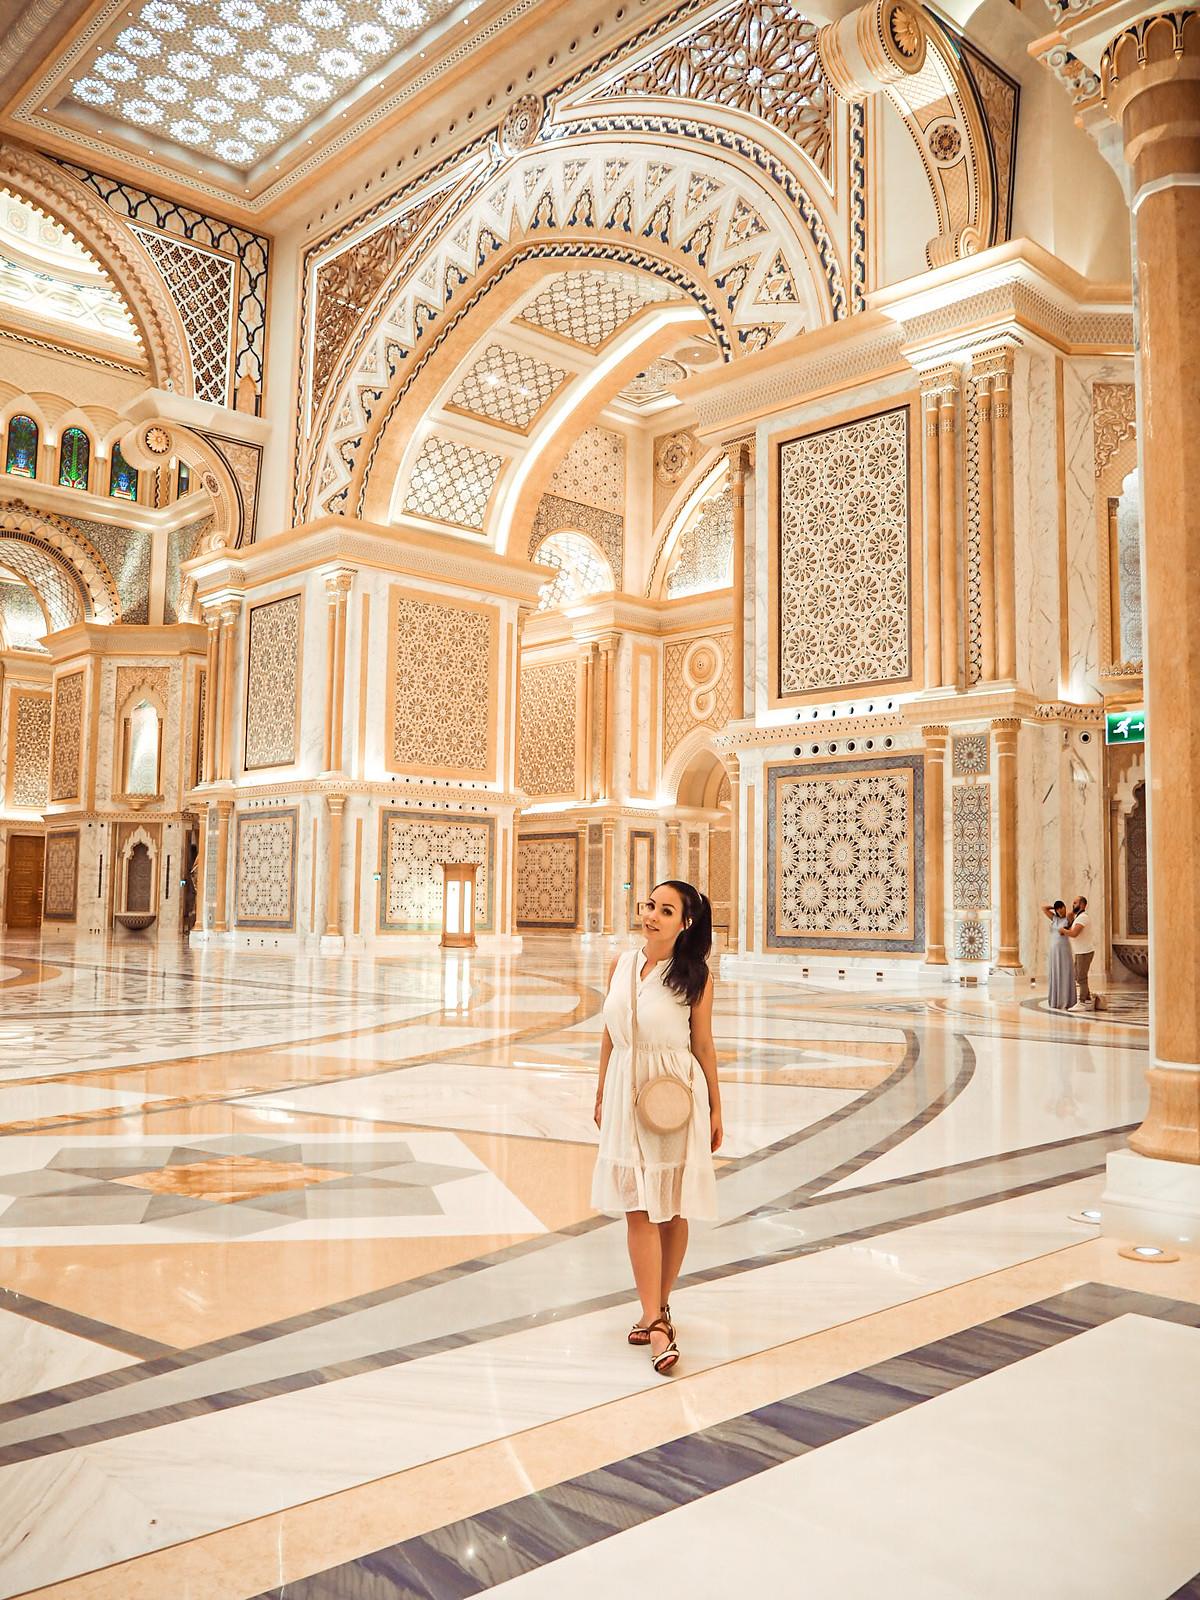 Qasr Al Watan palace